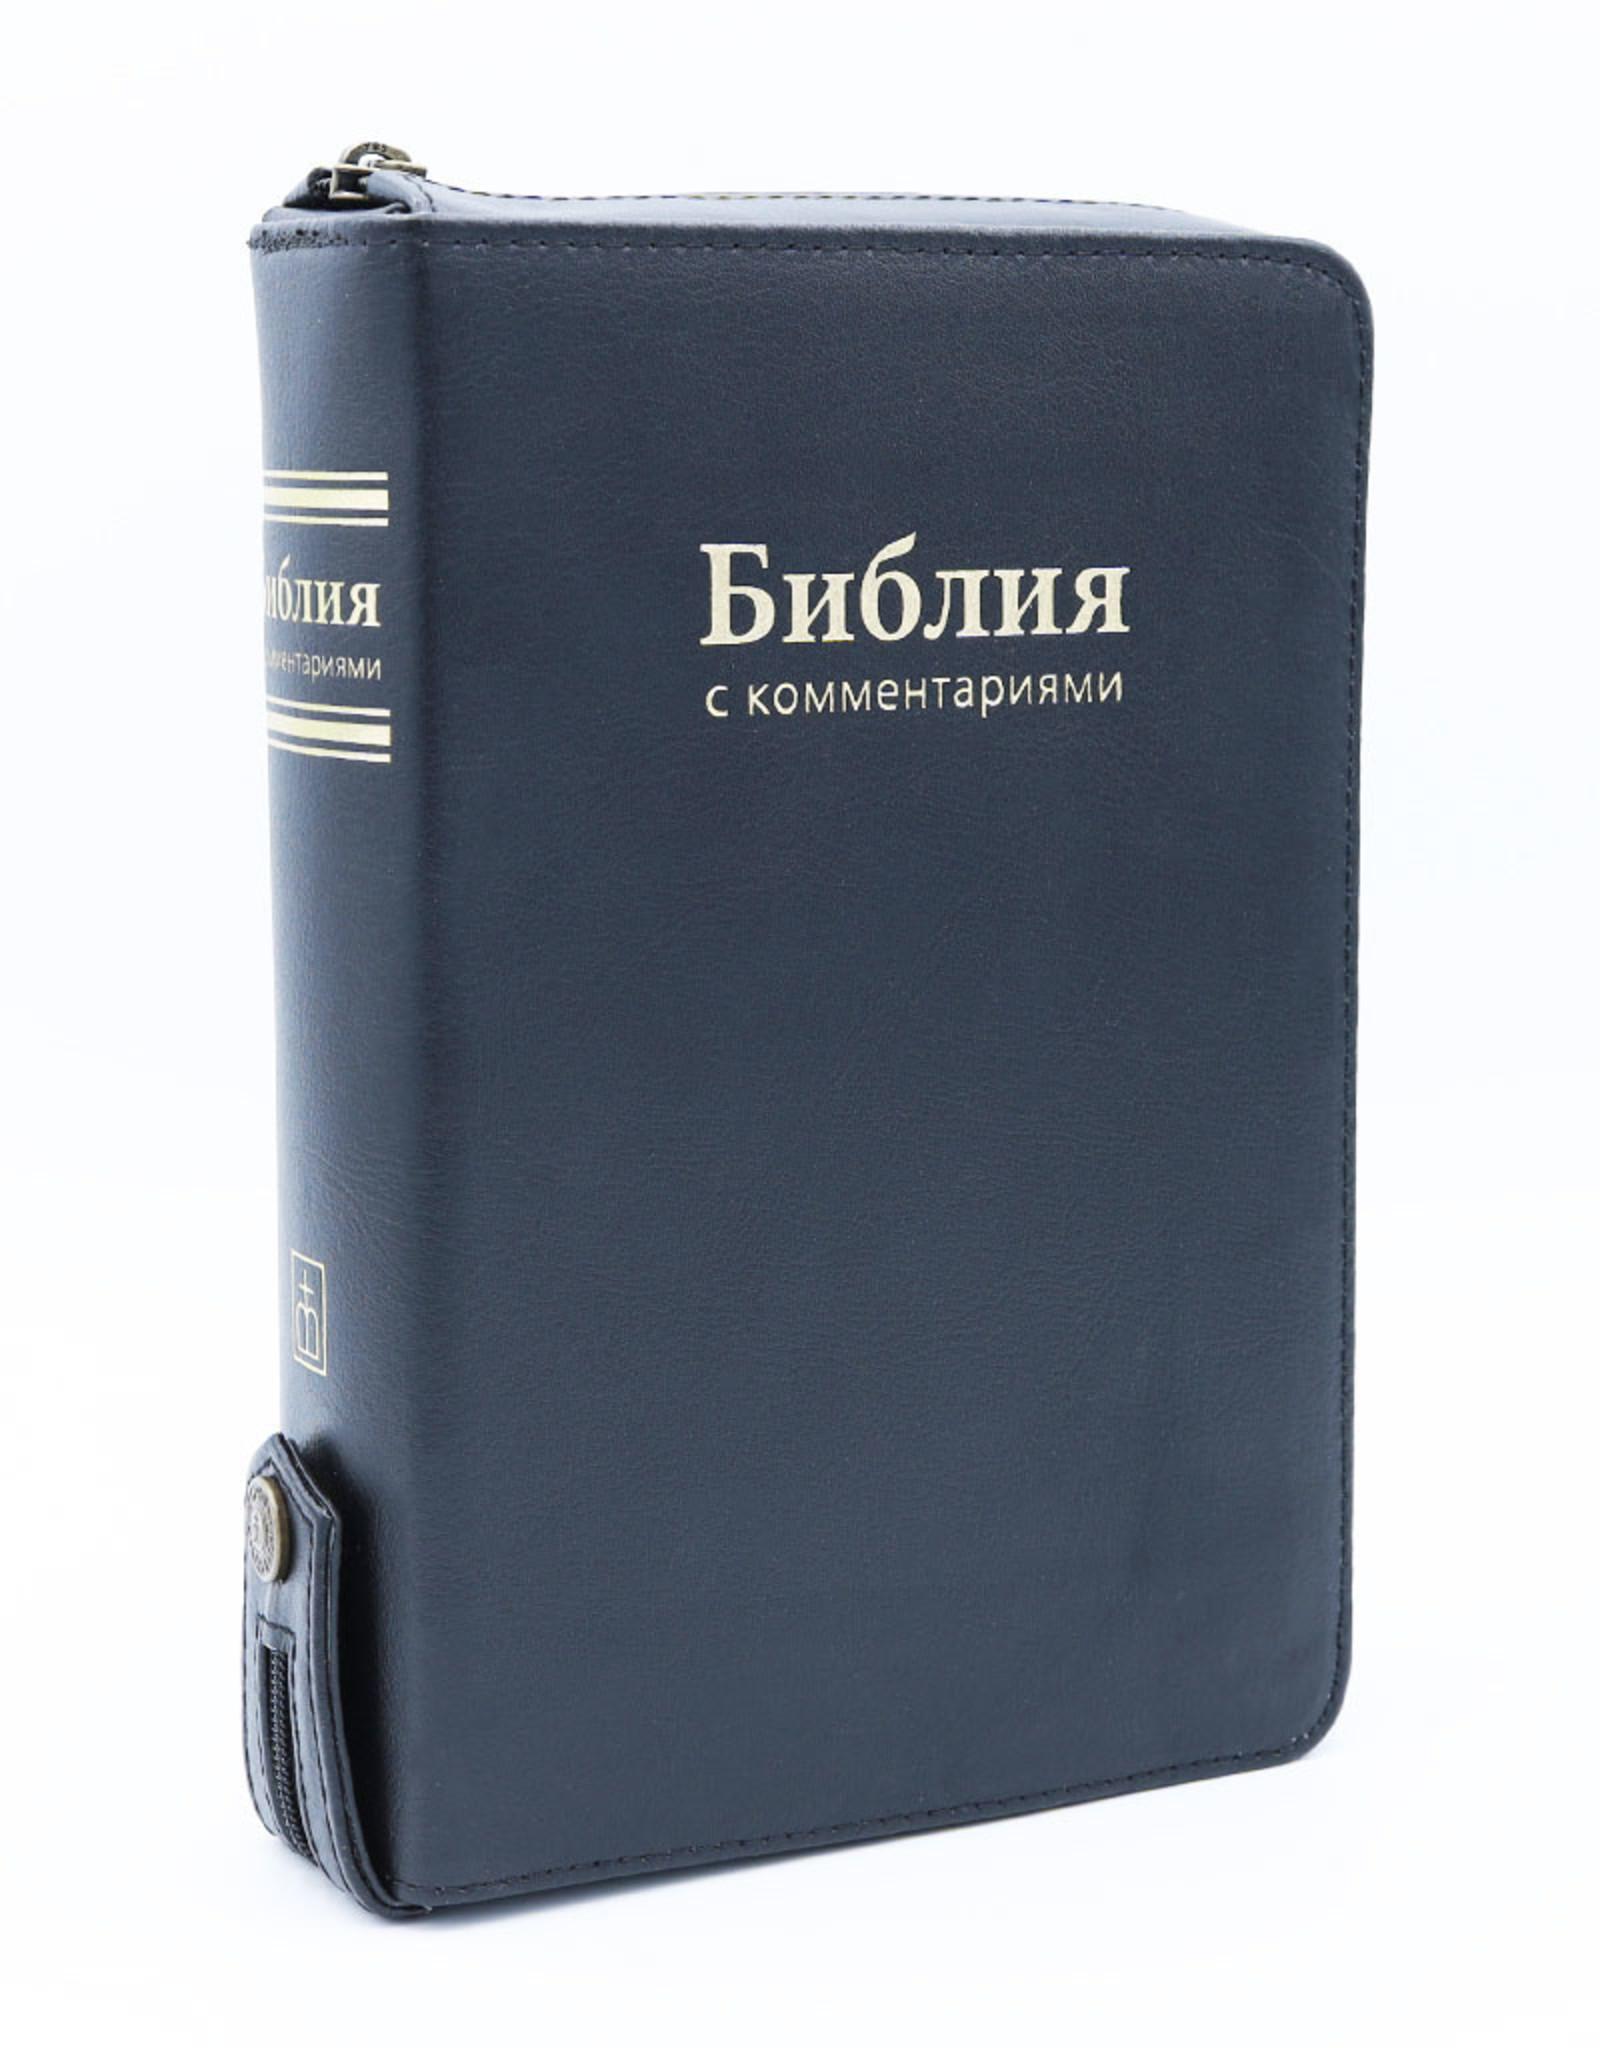 Библия с Комментариями (SYNO), Index, Small,  Black Leather with Zipper